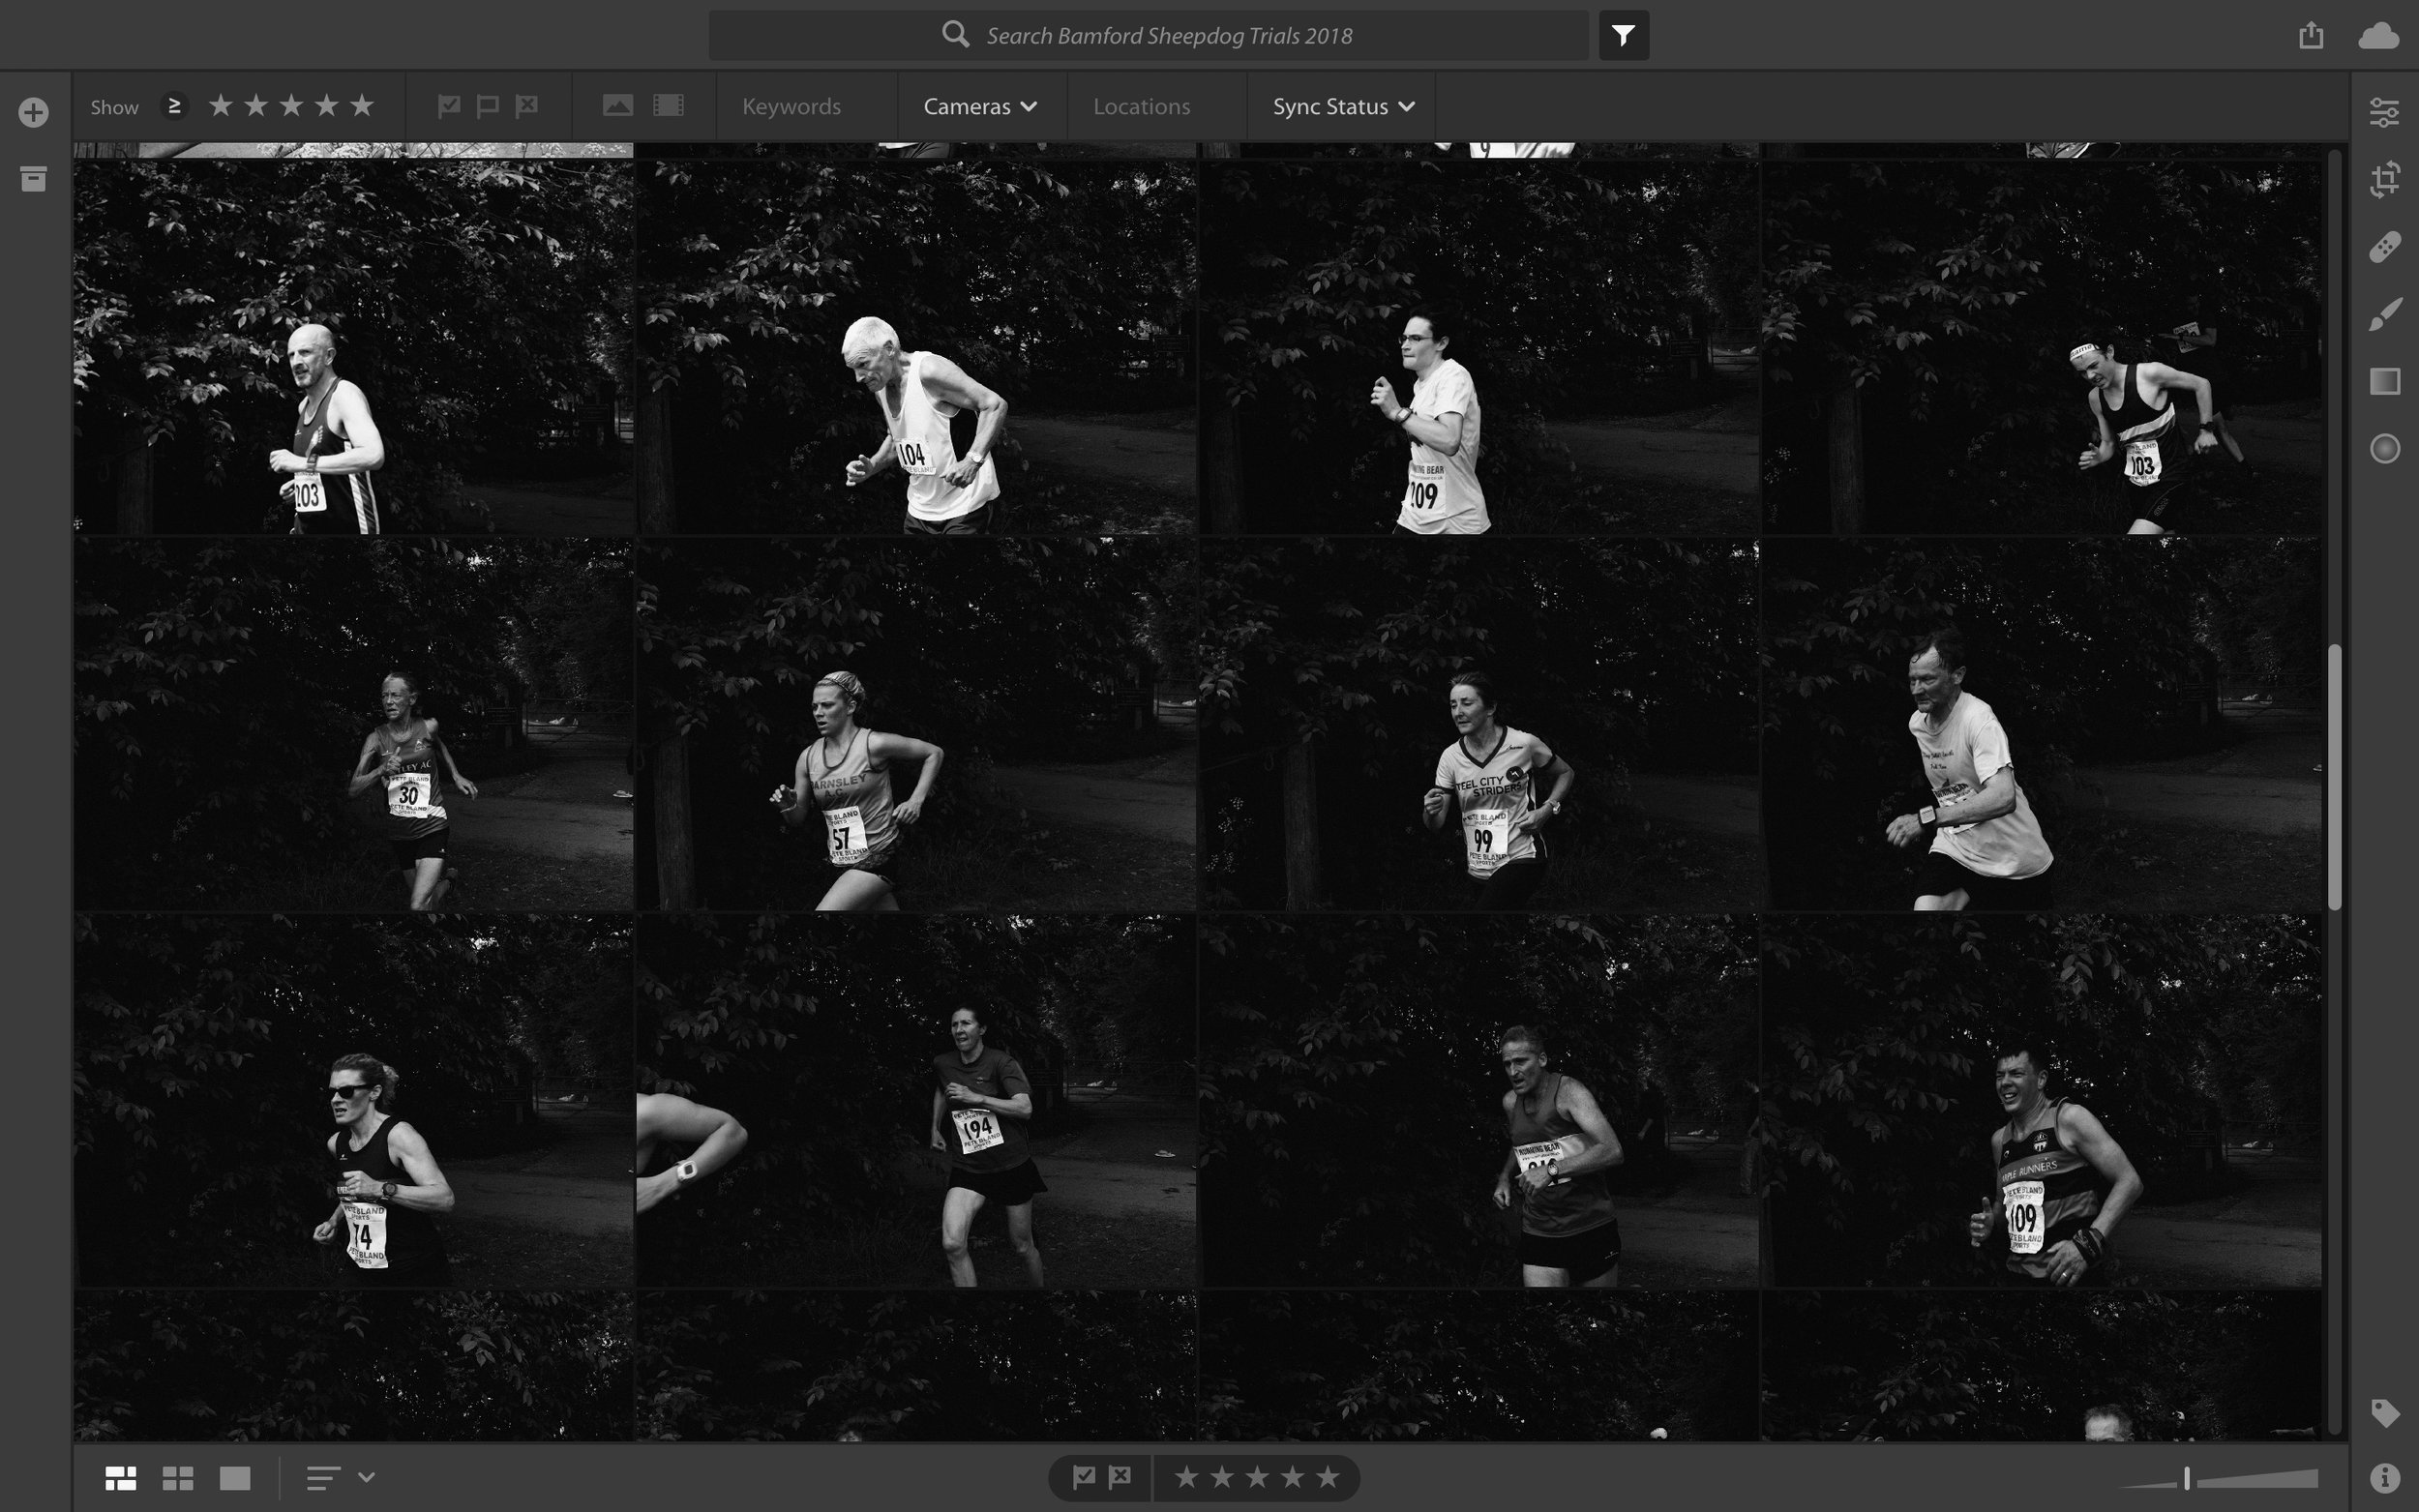 Screen Shot 2018-05-28 at 19.52.11.jpg